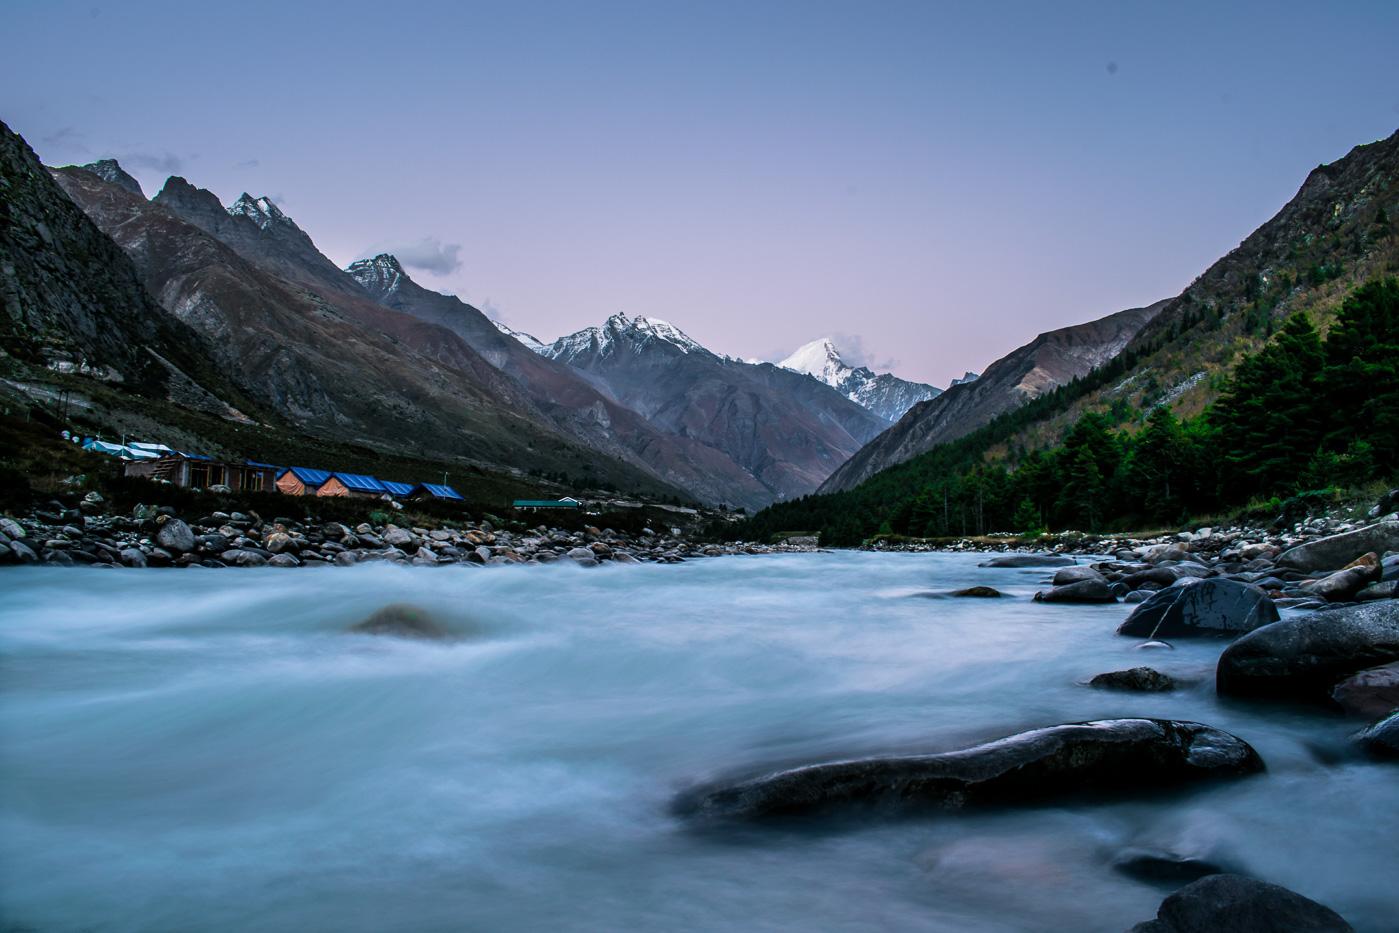 Spiti_Valley_Himachal_Pradesh_India_Kinnaur_Kullu_Manali_Road_trip_mountains_winter_Buddhist_Monastry_Sassy_Pilgrim_Travel_Blog_female_Blogger_Solo_Tips